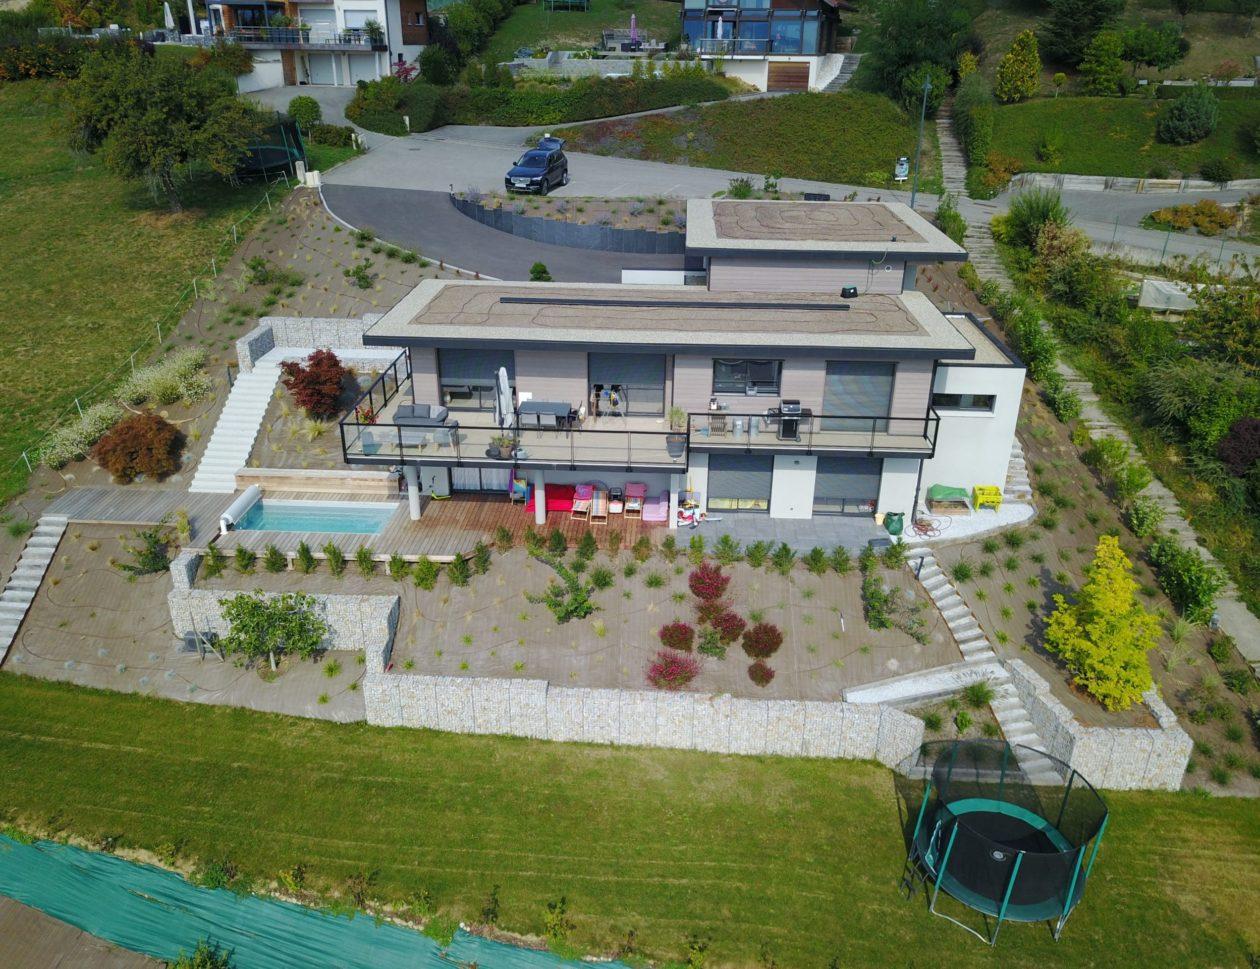 réaménagment-jardins-pente-terrasse-id-jardins-min